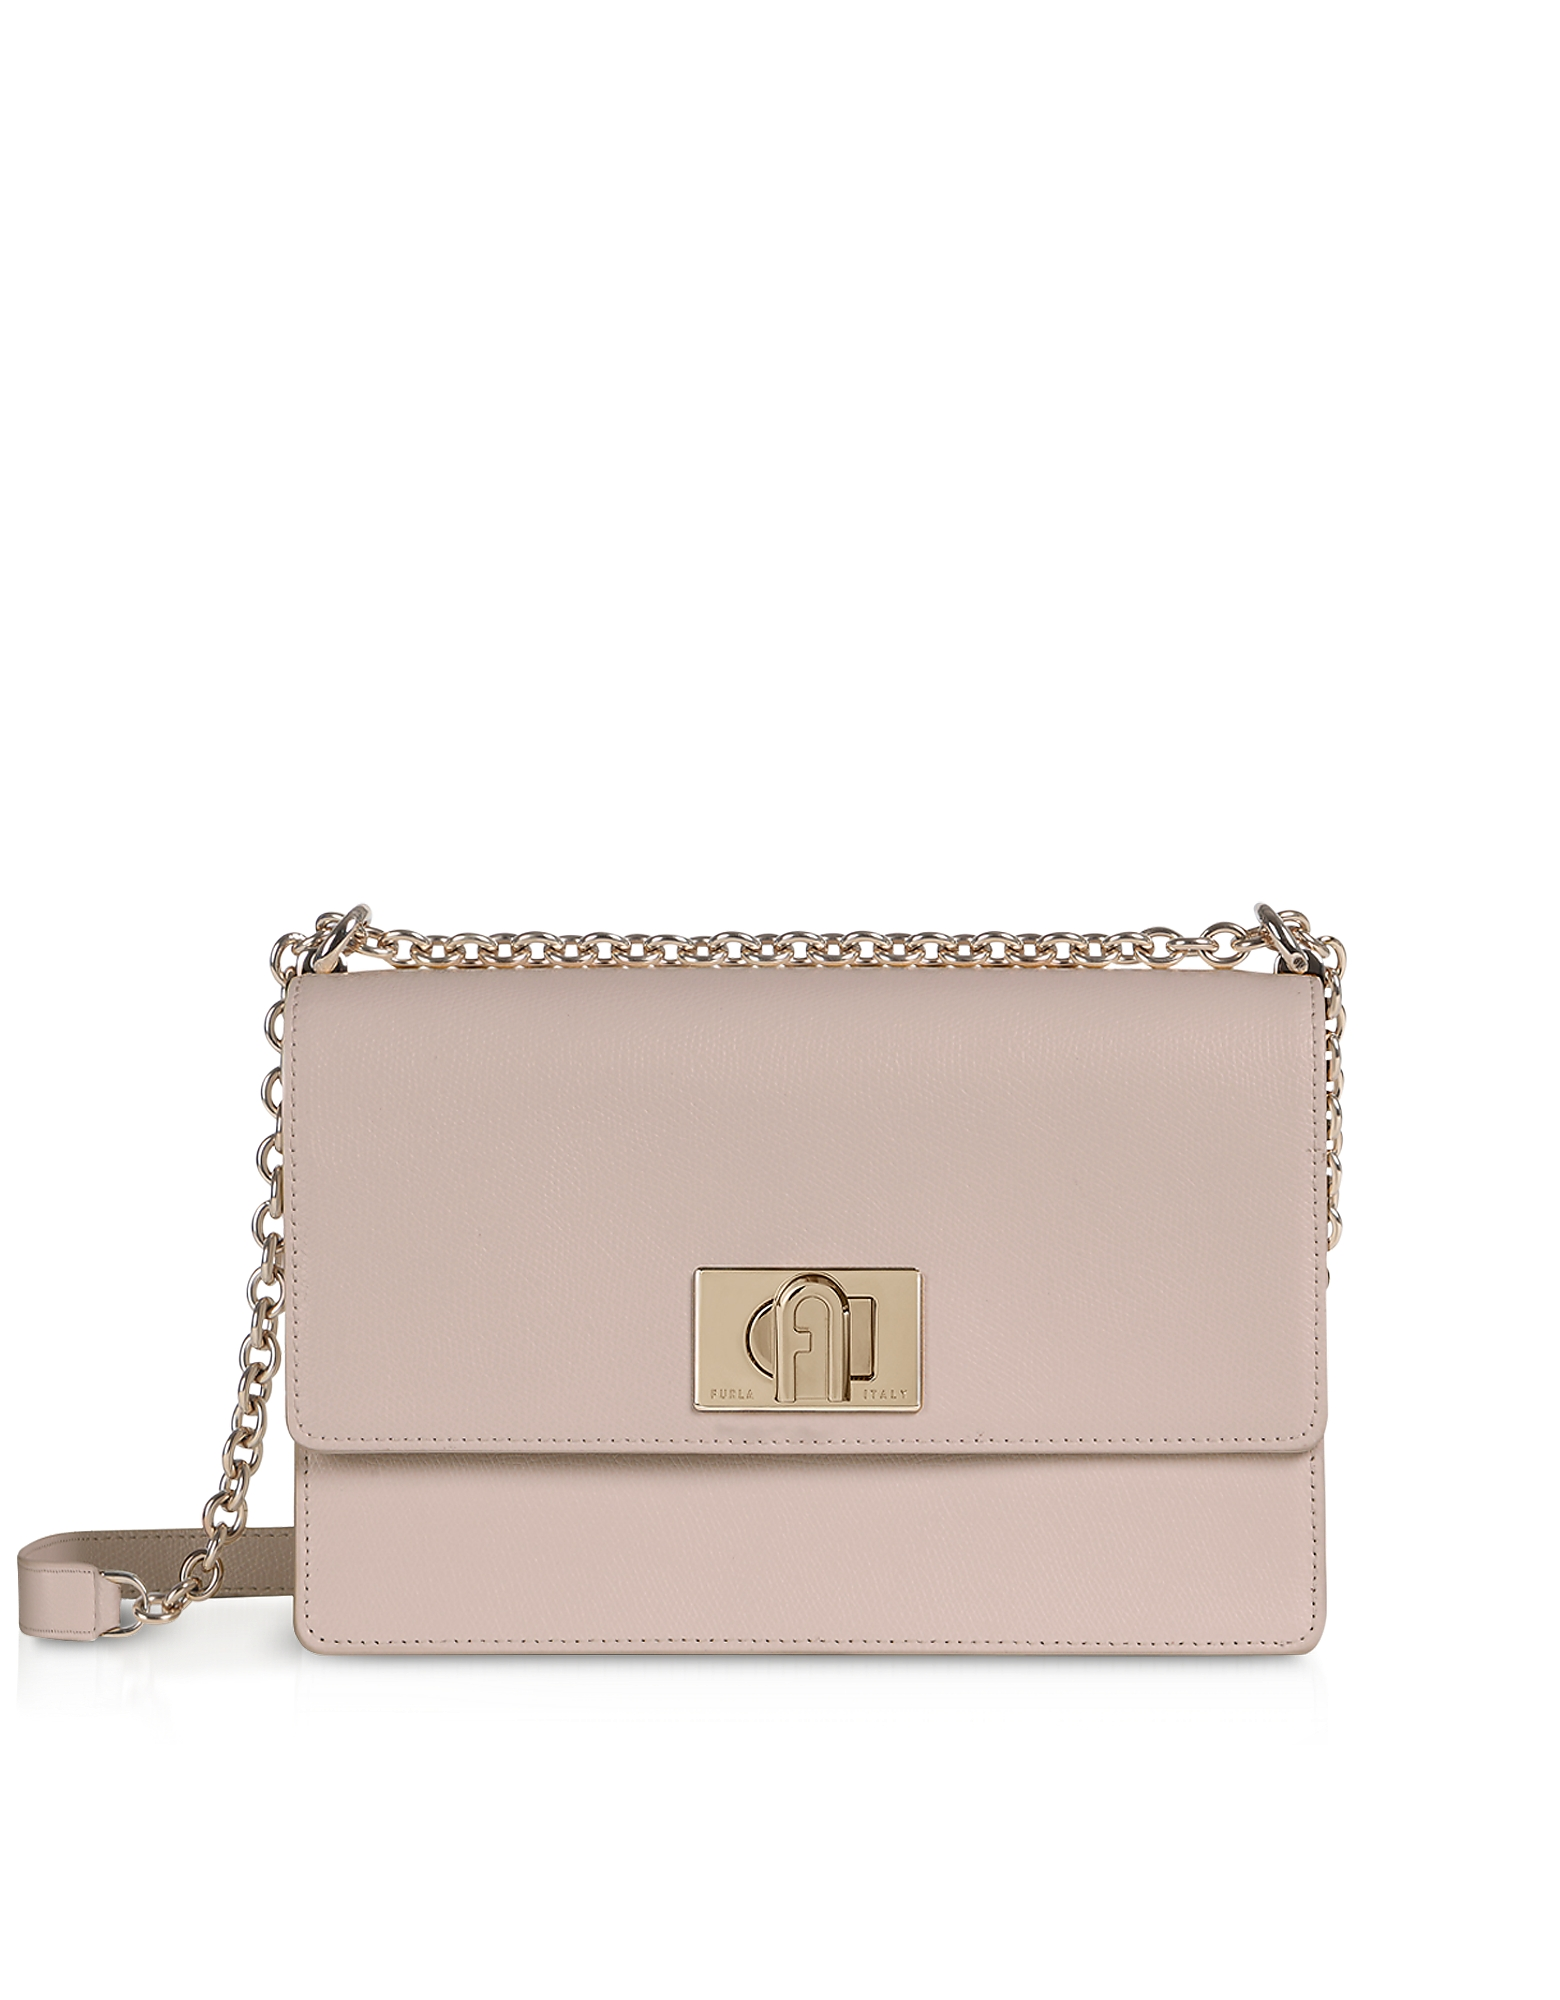 Furla Designer Handbags, 1927 S Crossbody Bag 24